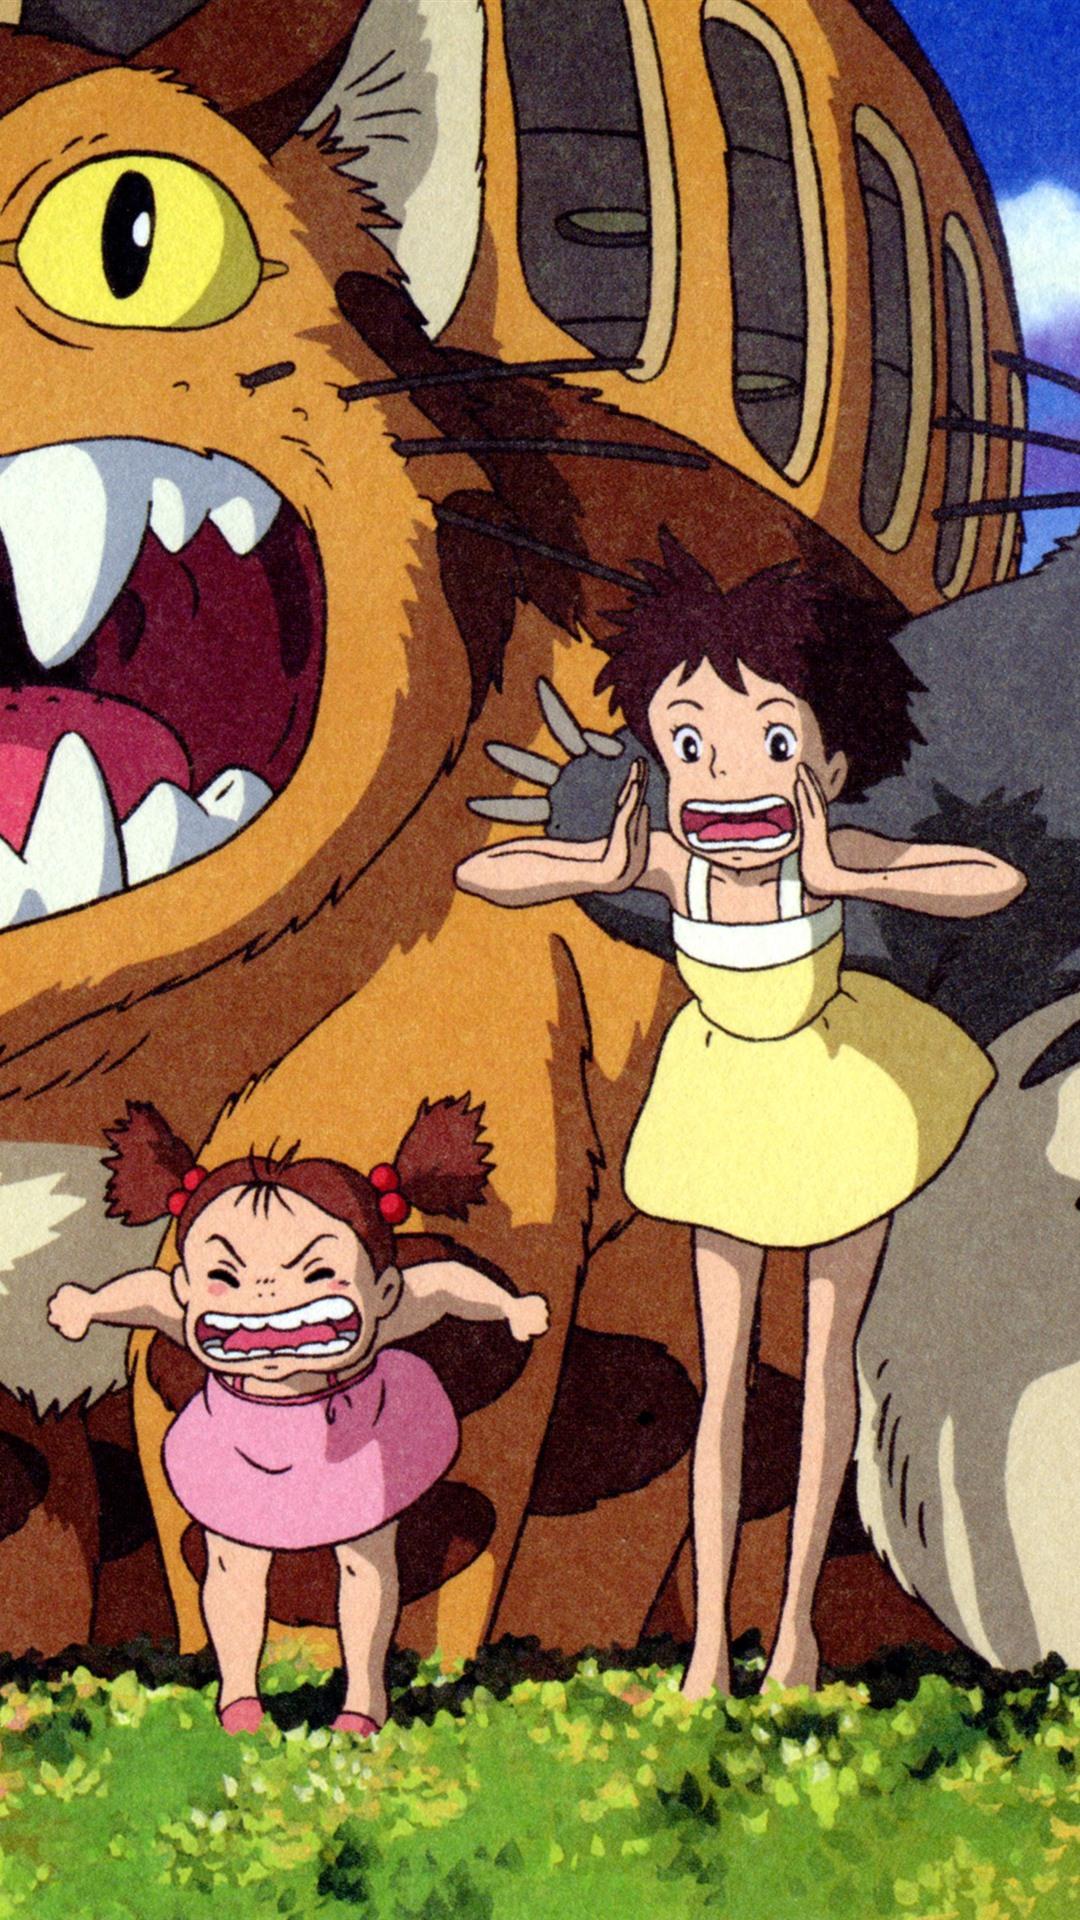 Wallpaper My Neighbor Totoro, Japanese anime 3840x2160 UHD ...